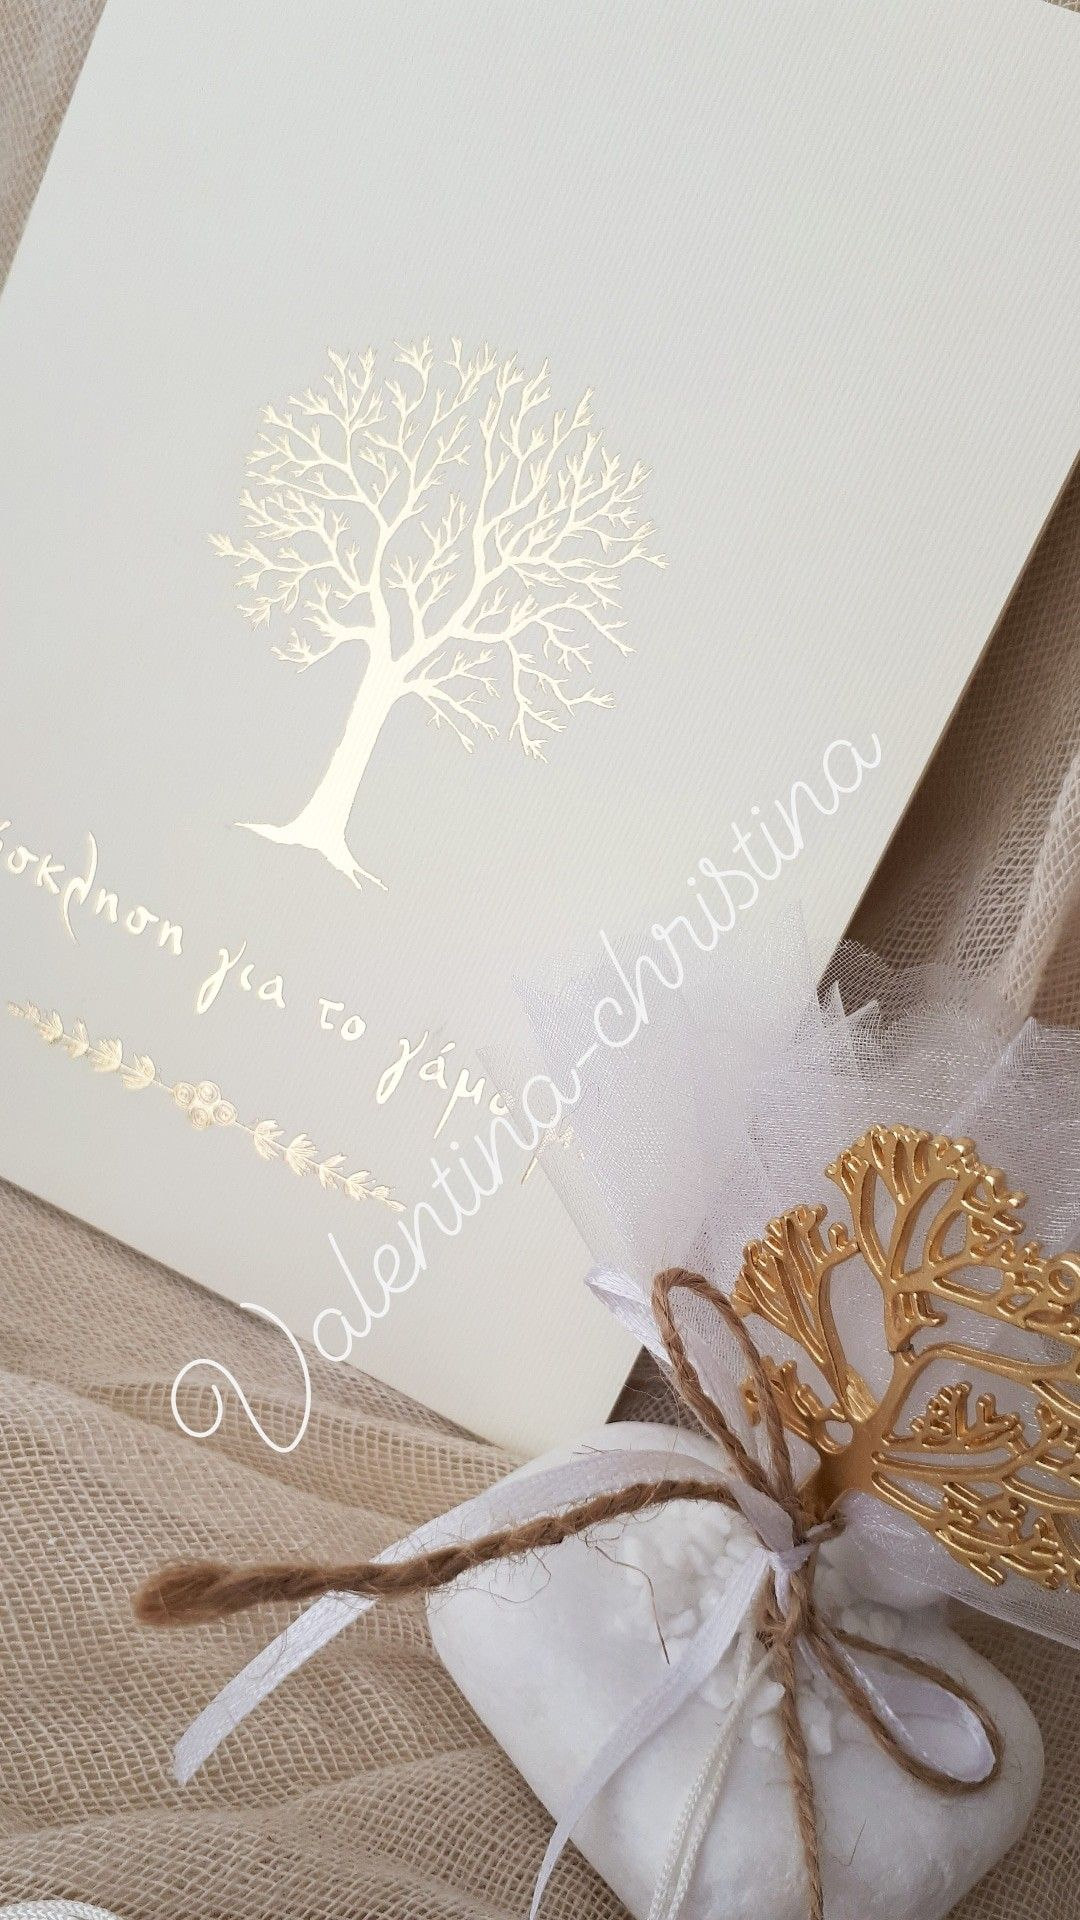 8805972df064 Πρωτότυπα προσκλητήρια σε στυλ κάρτας δίπτυχο σε σκληρό χαρτί με χρυσοτυπια  το δέντρο της ζωής by